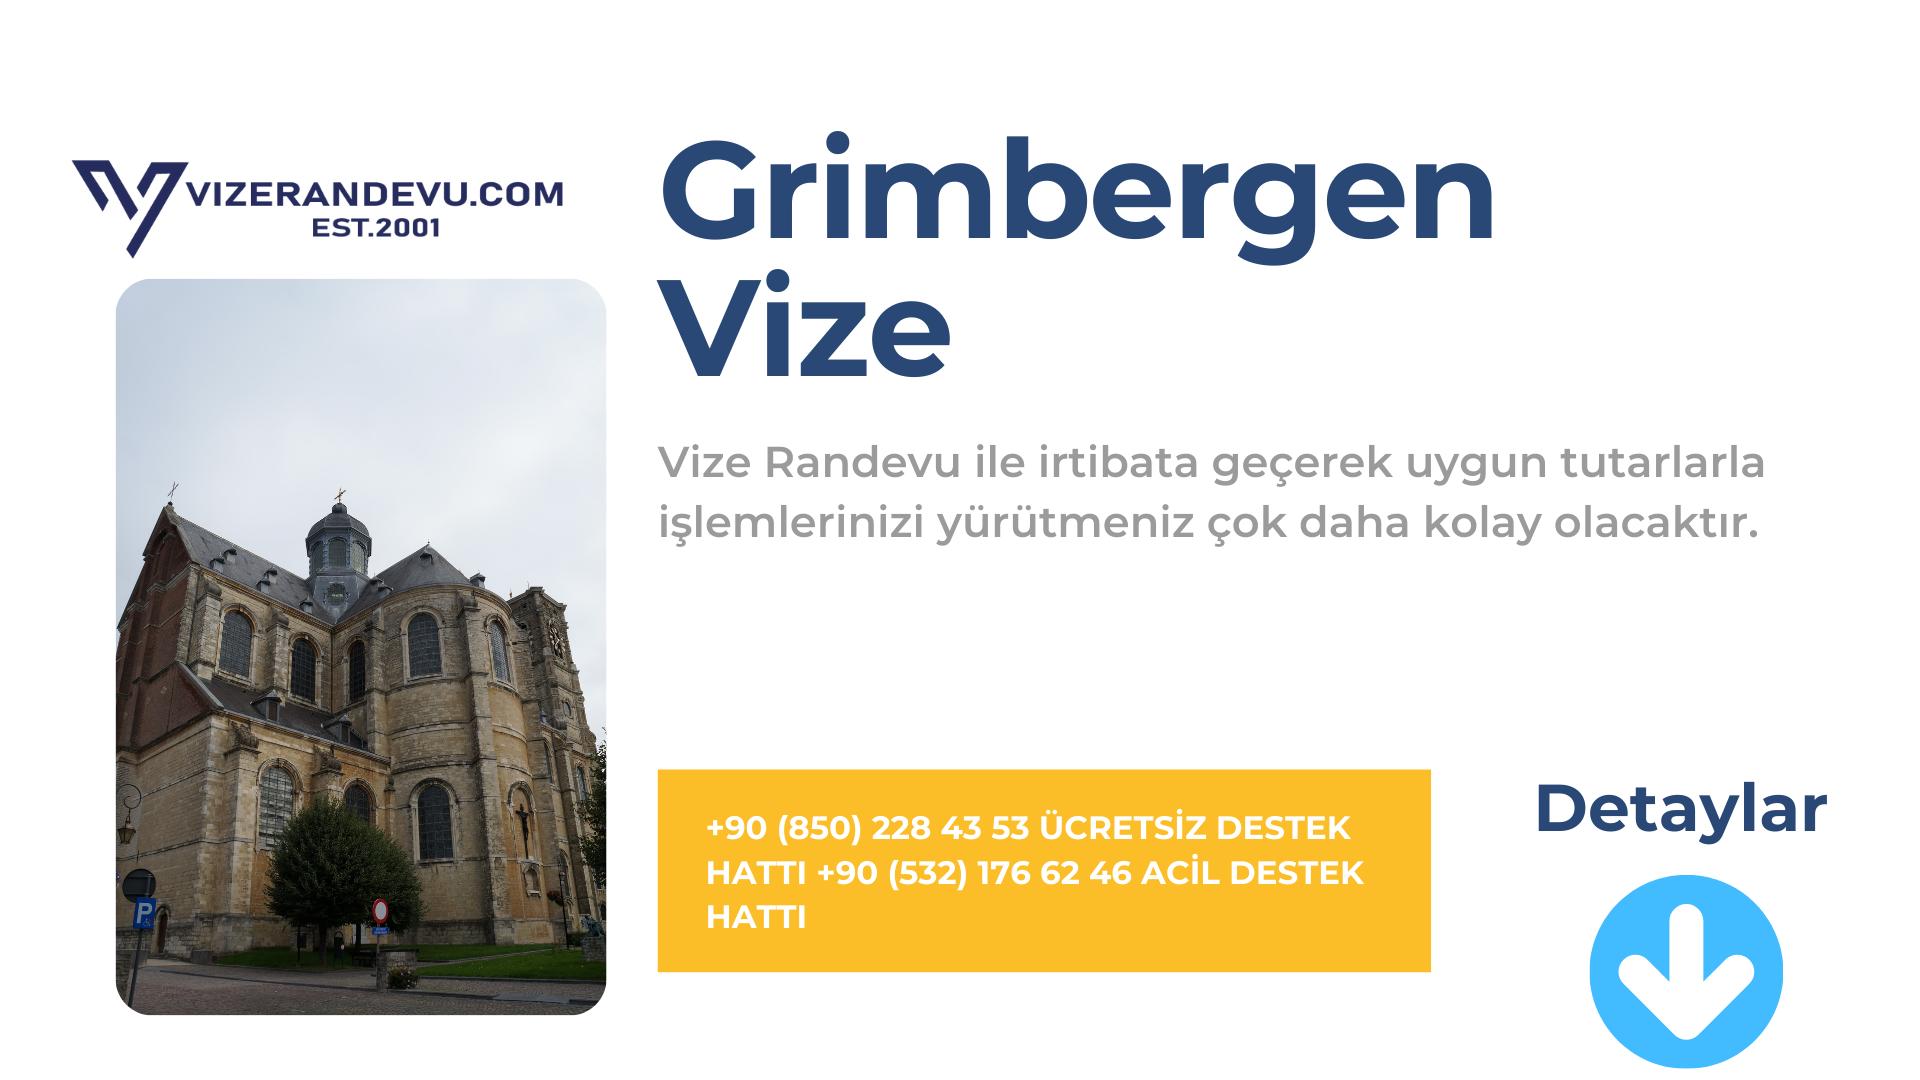 Grimbergen Vize